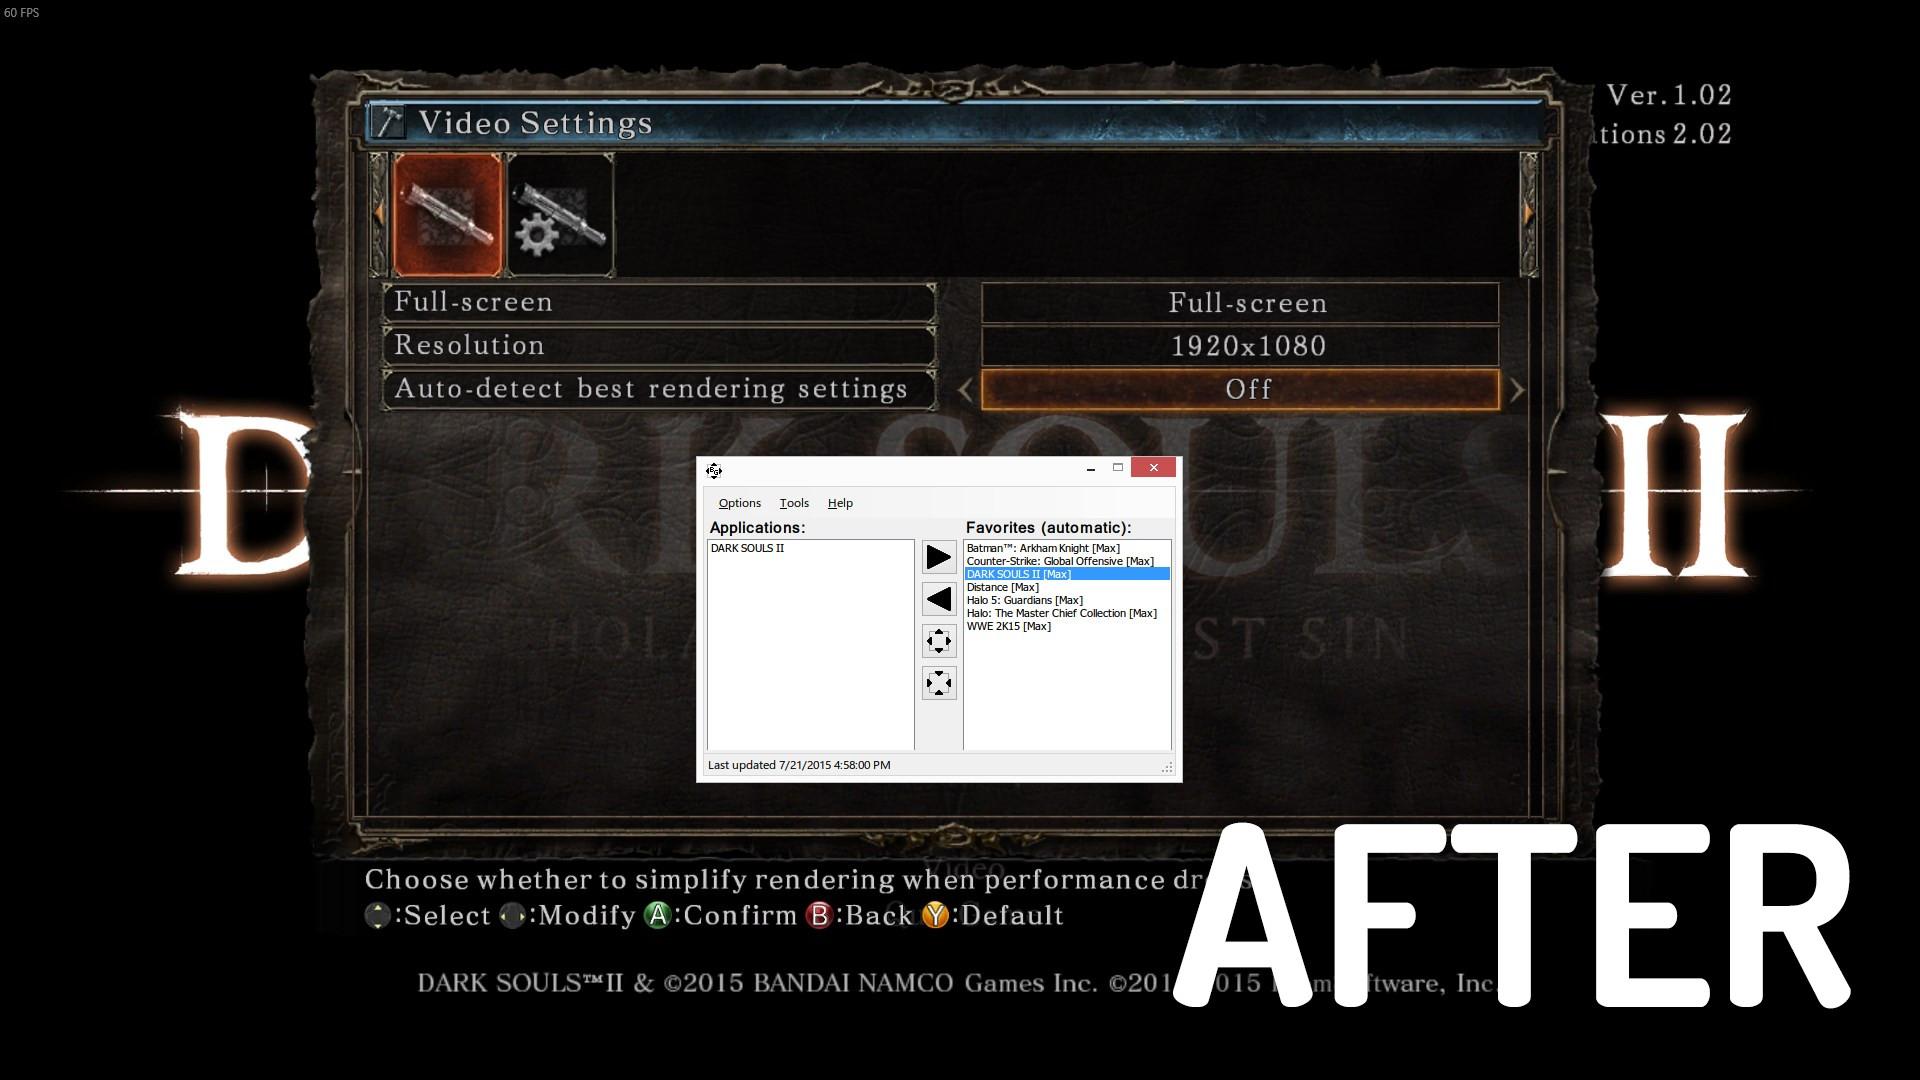 After Borderless-Gaming